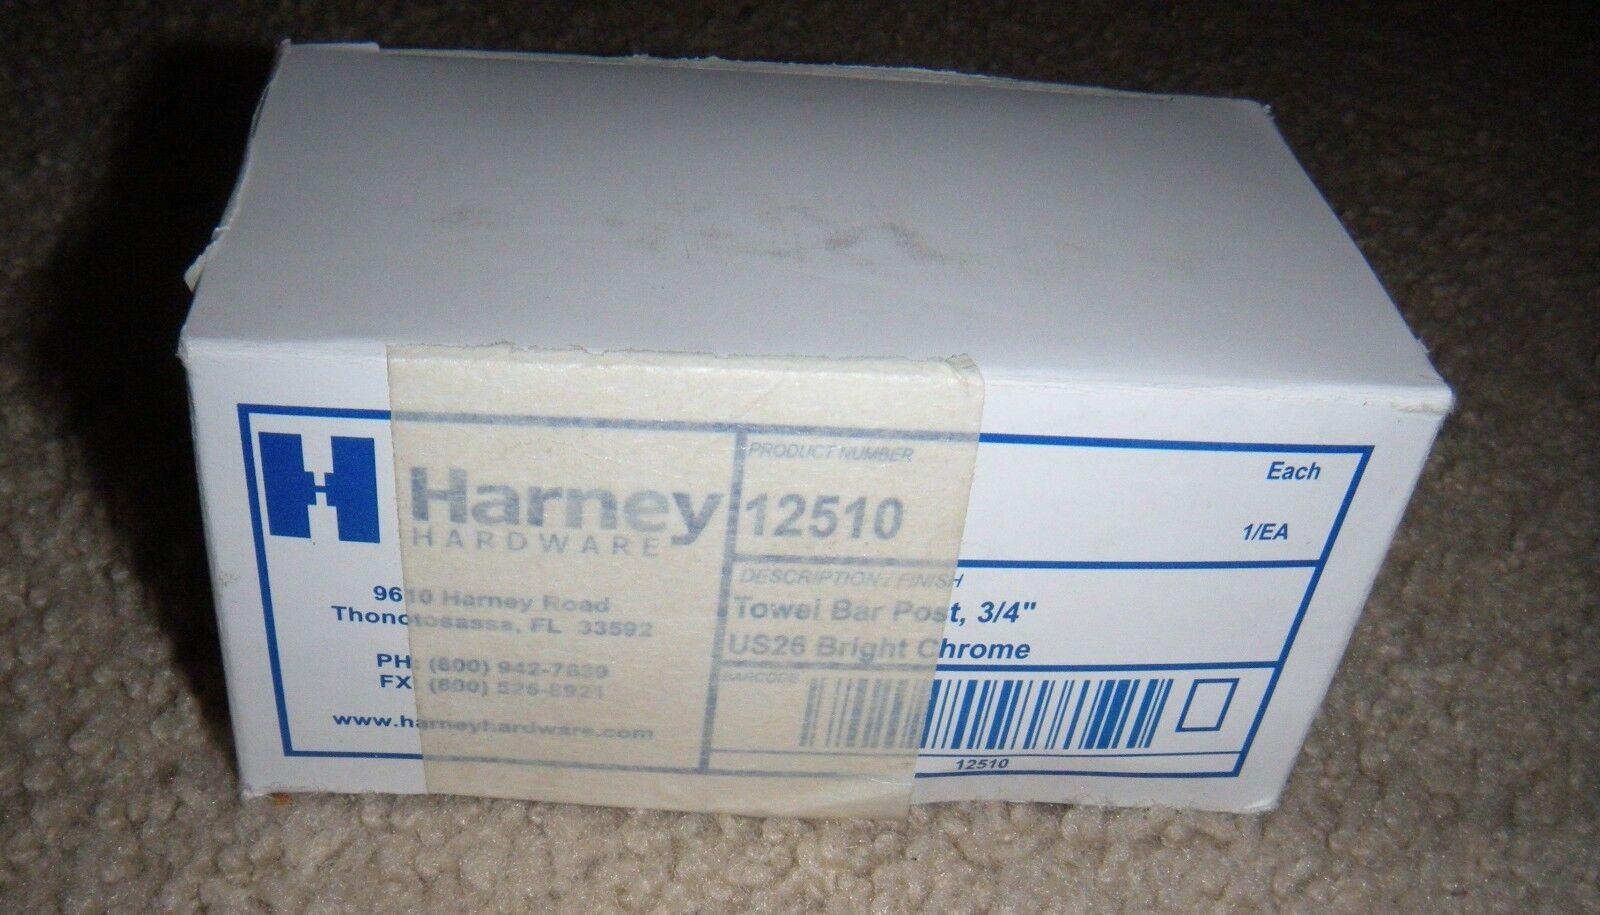 "Harney Towel Bar Brackets Post - 3/4"" Chrome w/ Mounting Har"